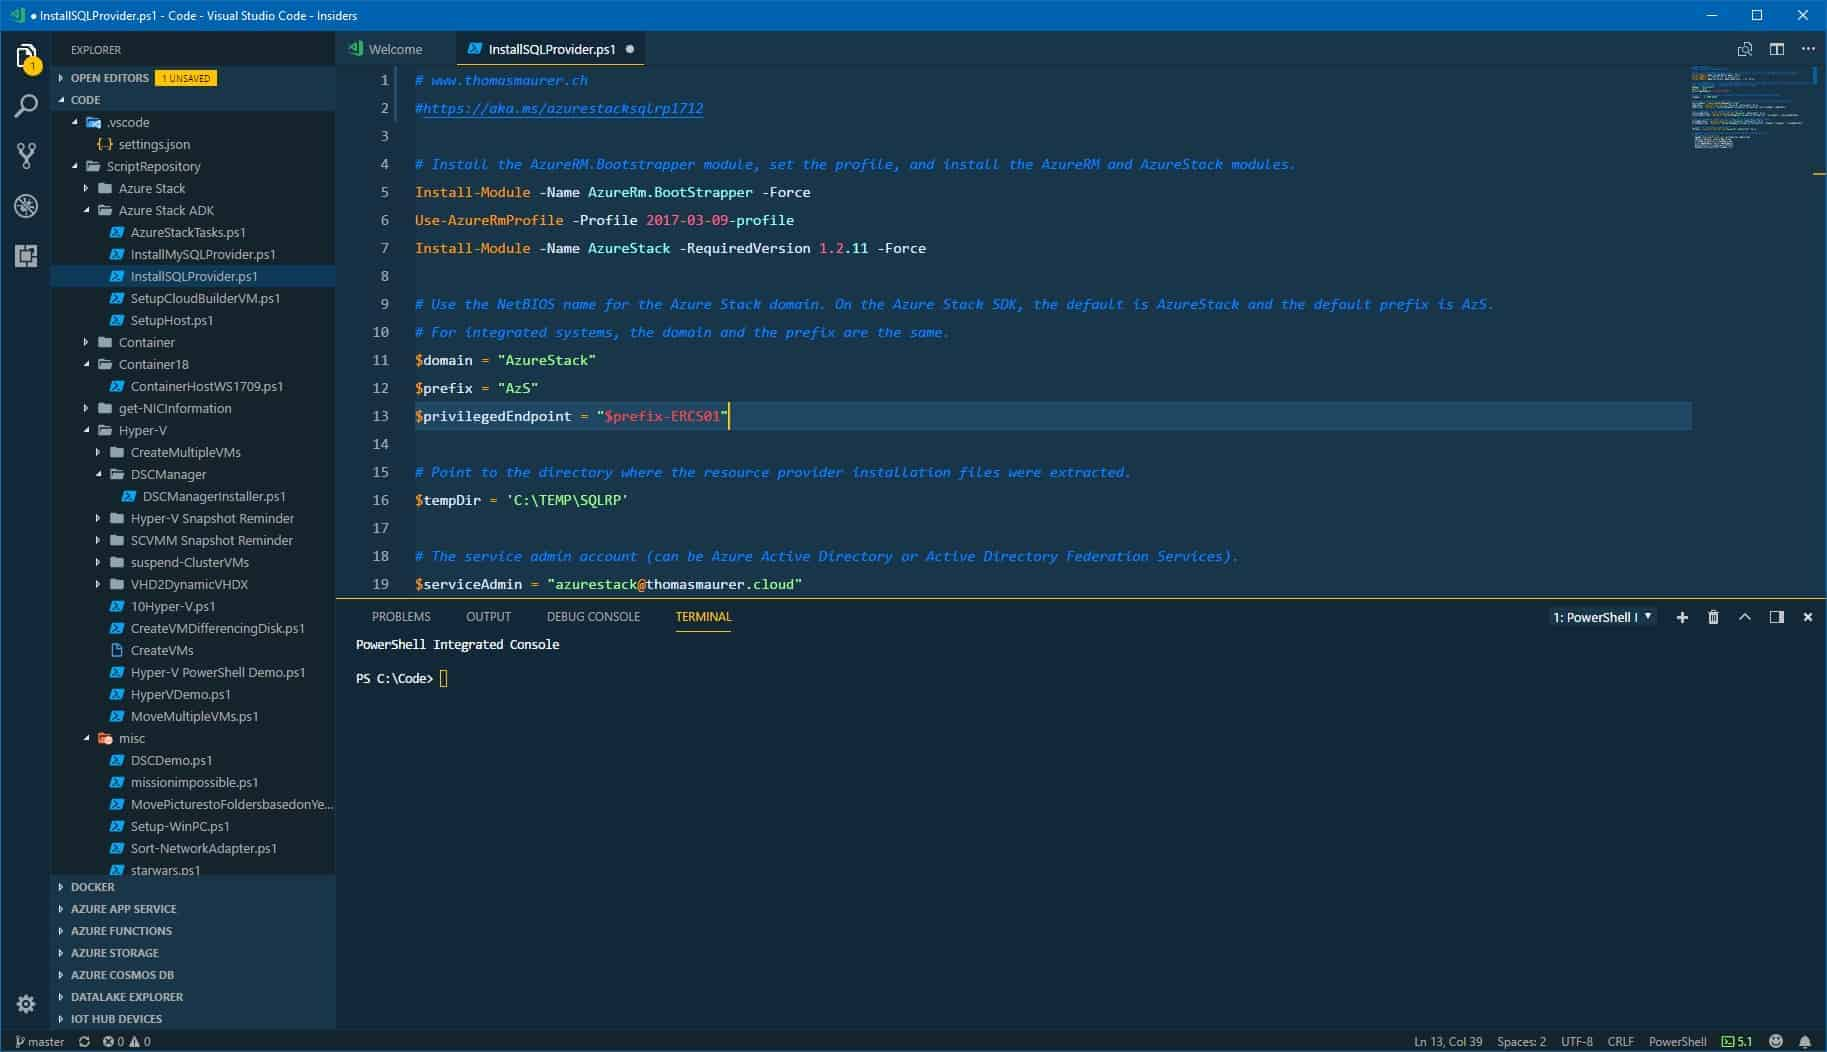 My Favorite Visual Studio Code Themes - Thomas Maurer